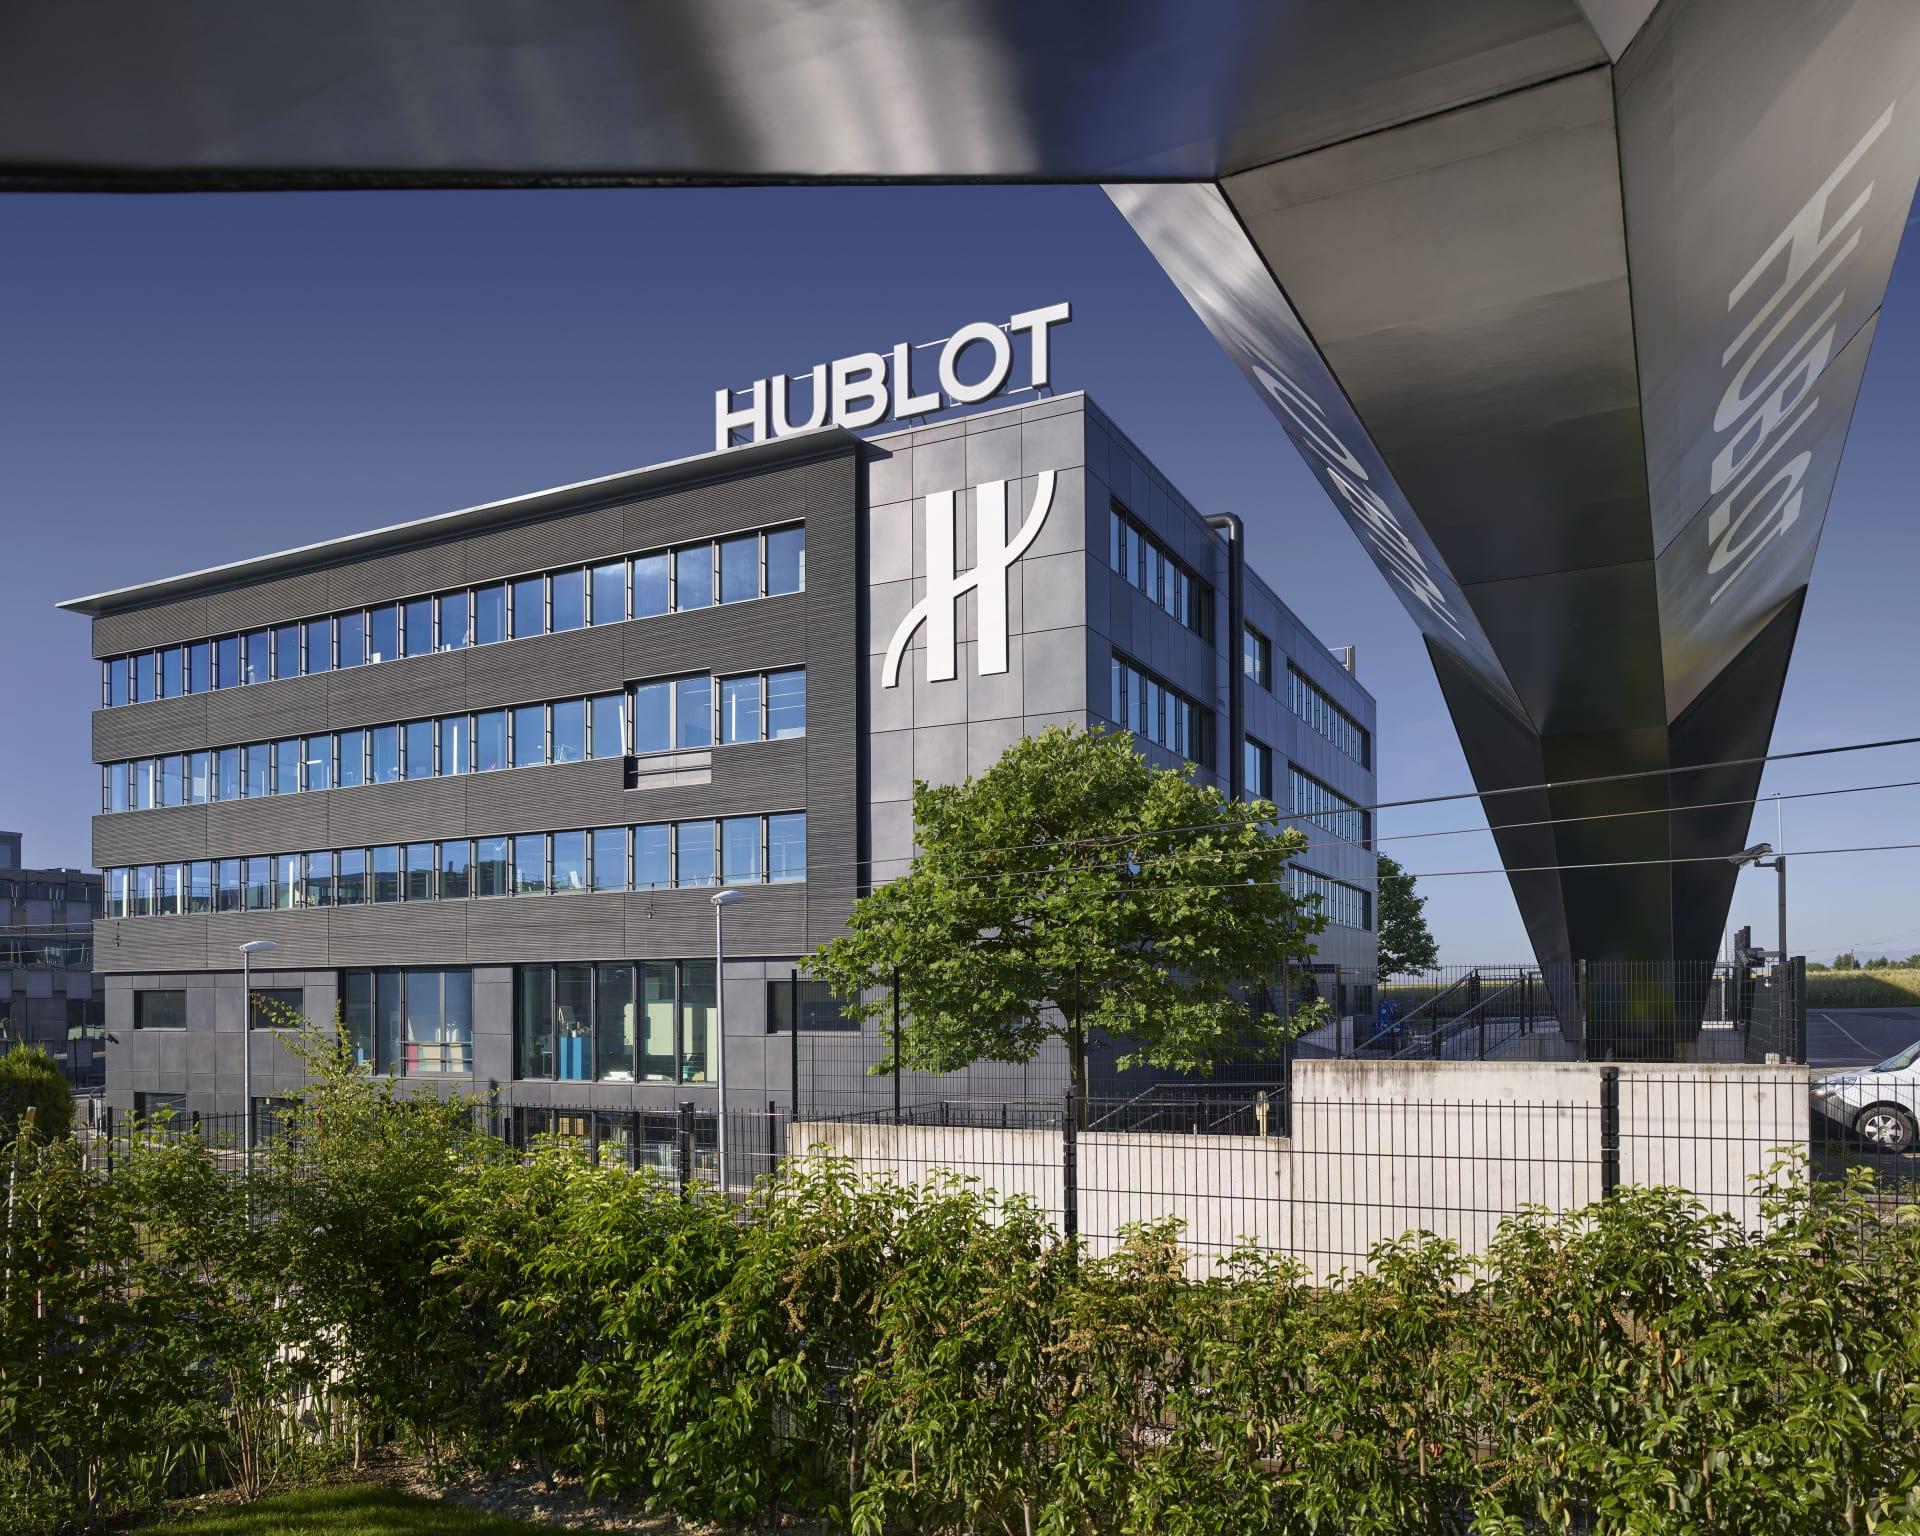 Hublot manufacture